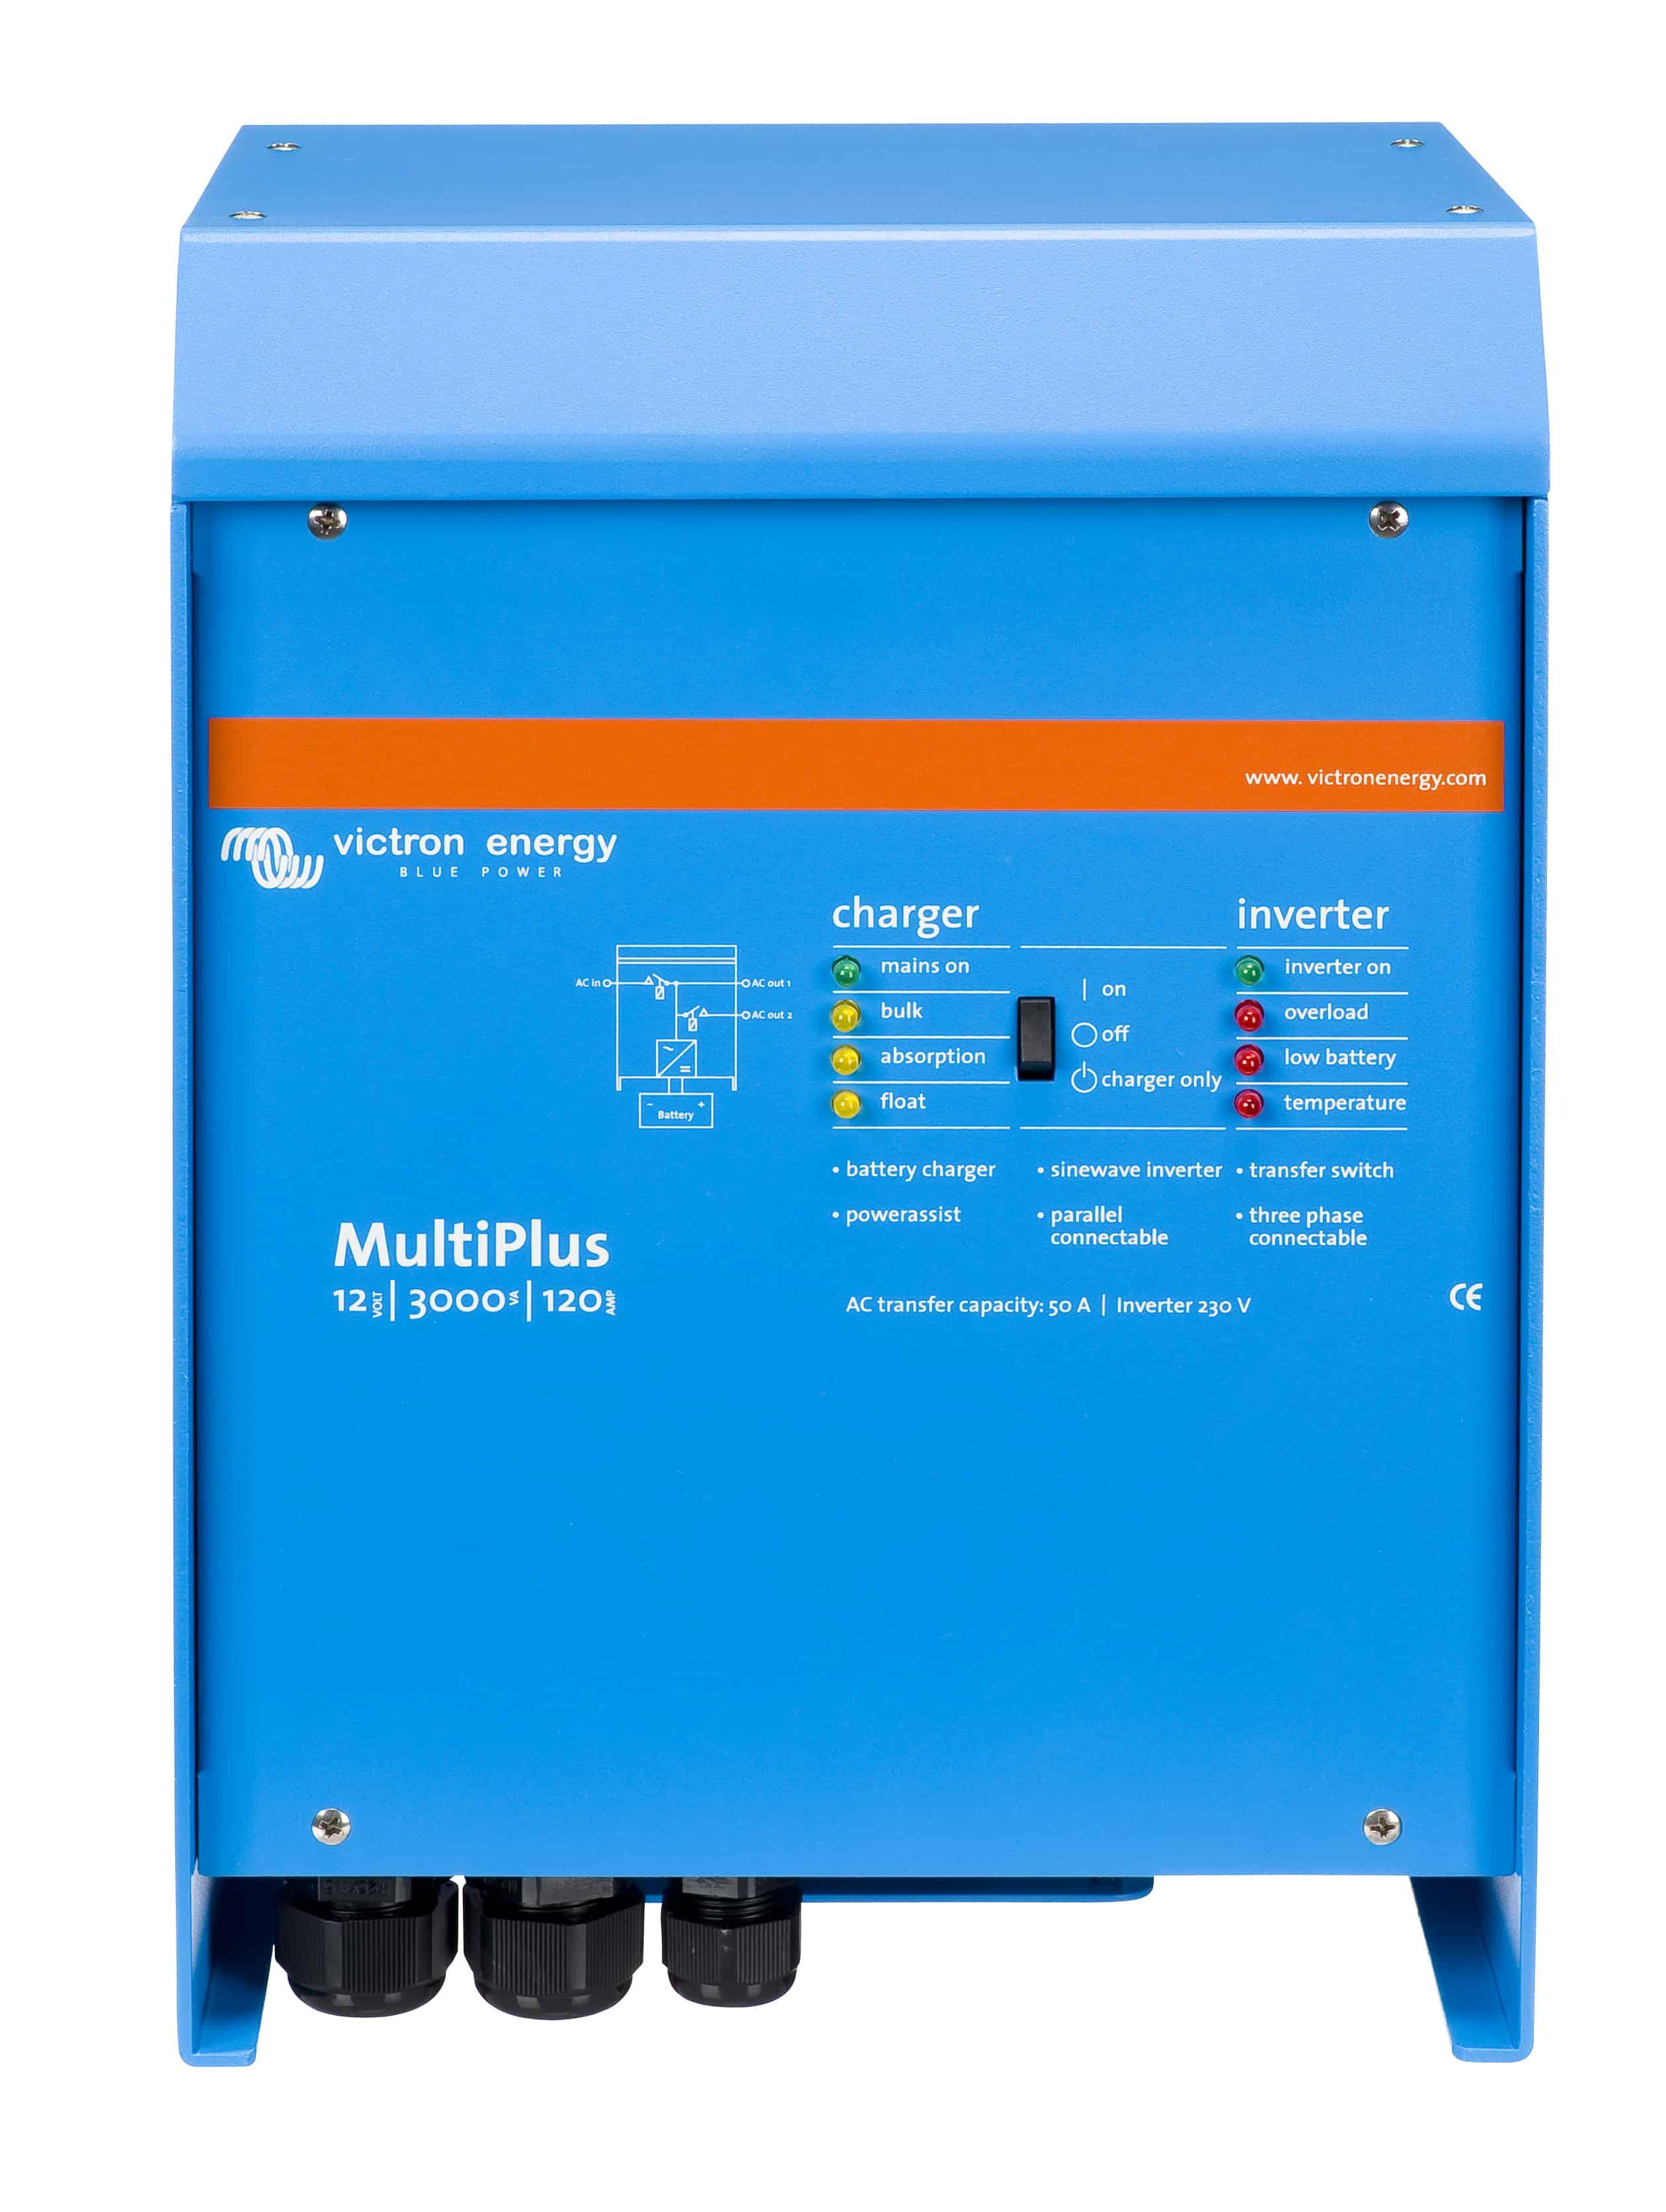 Victron Energy MultiPlus 3kVA 12v Inverter